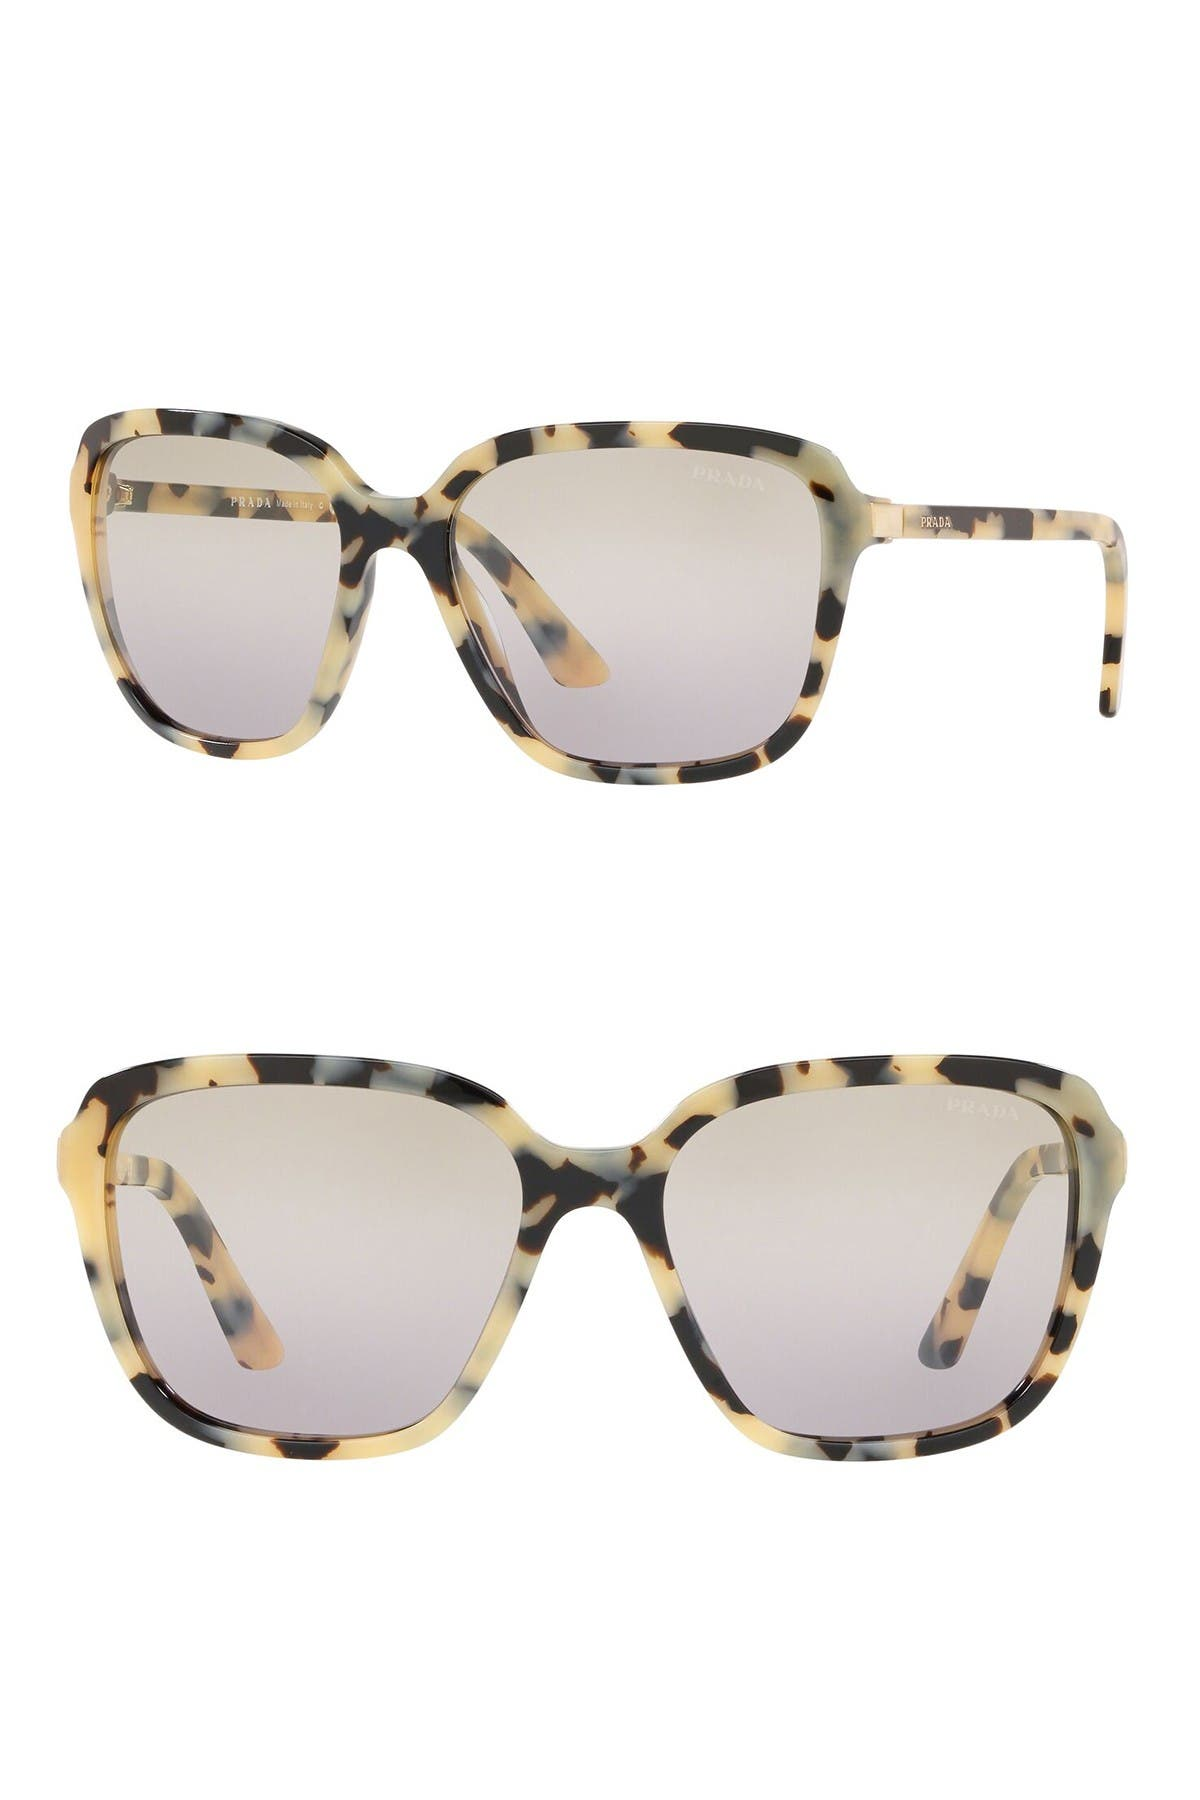 Image of Prada 60mm Pillow Sunglasses